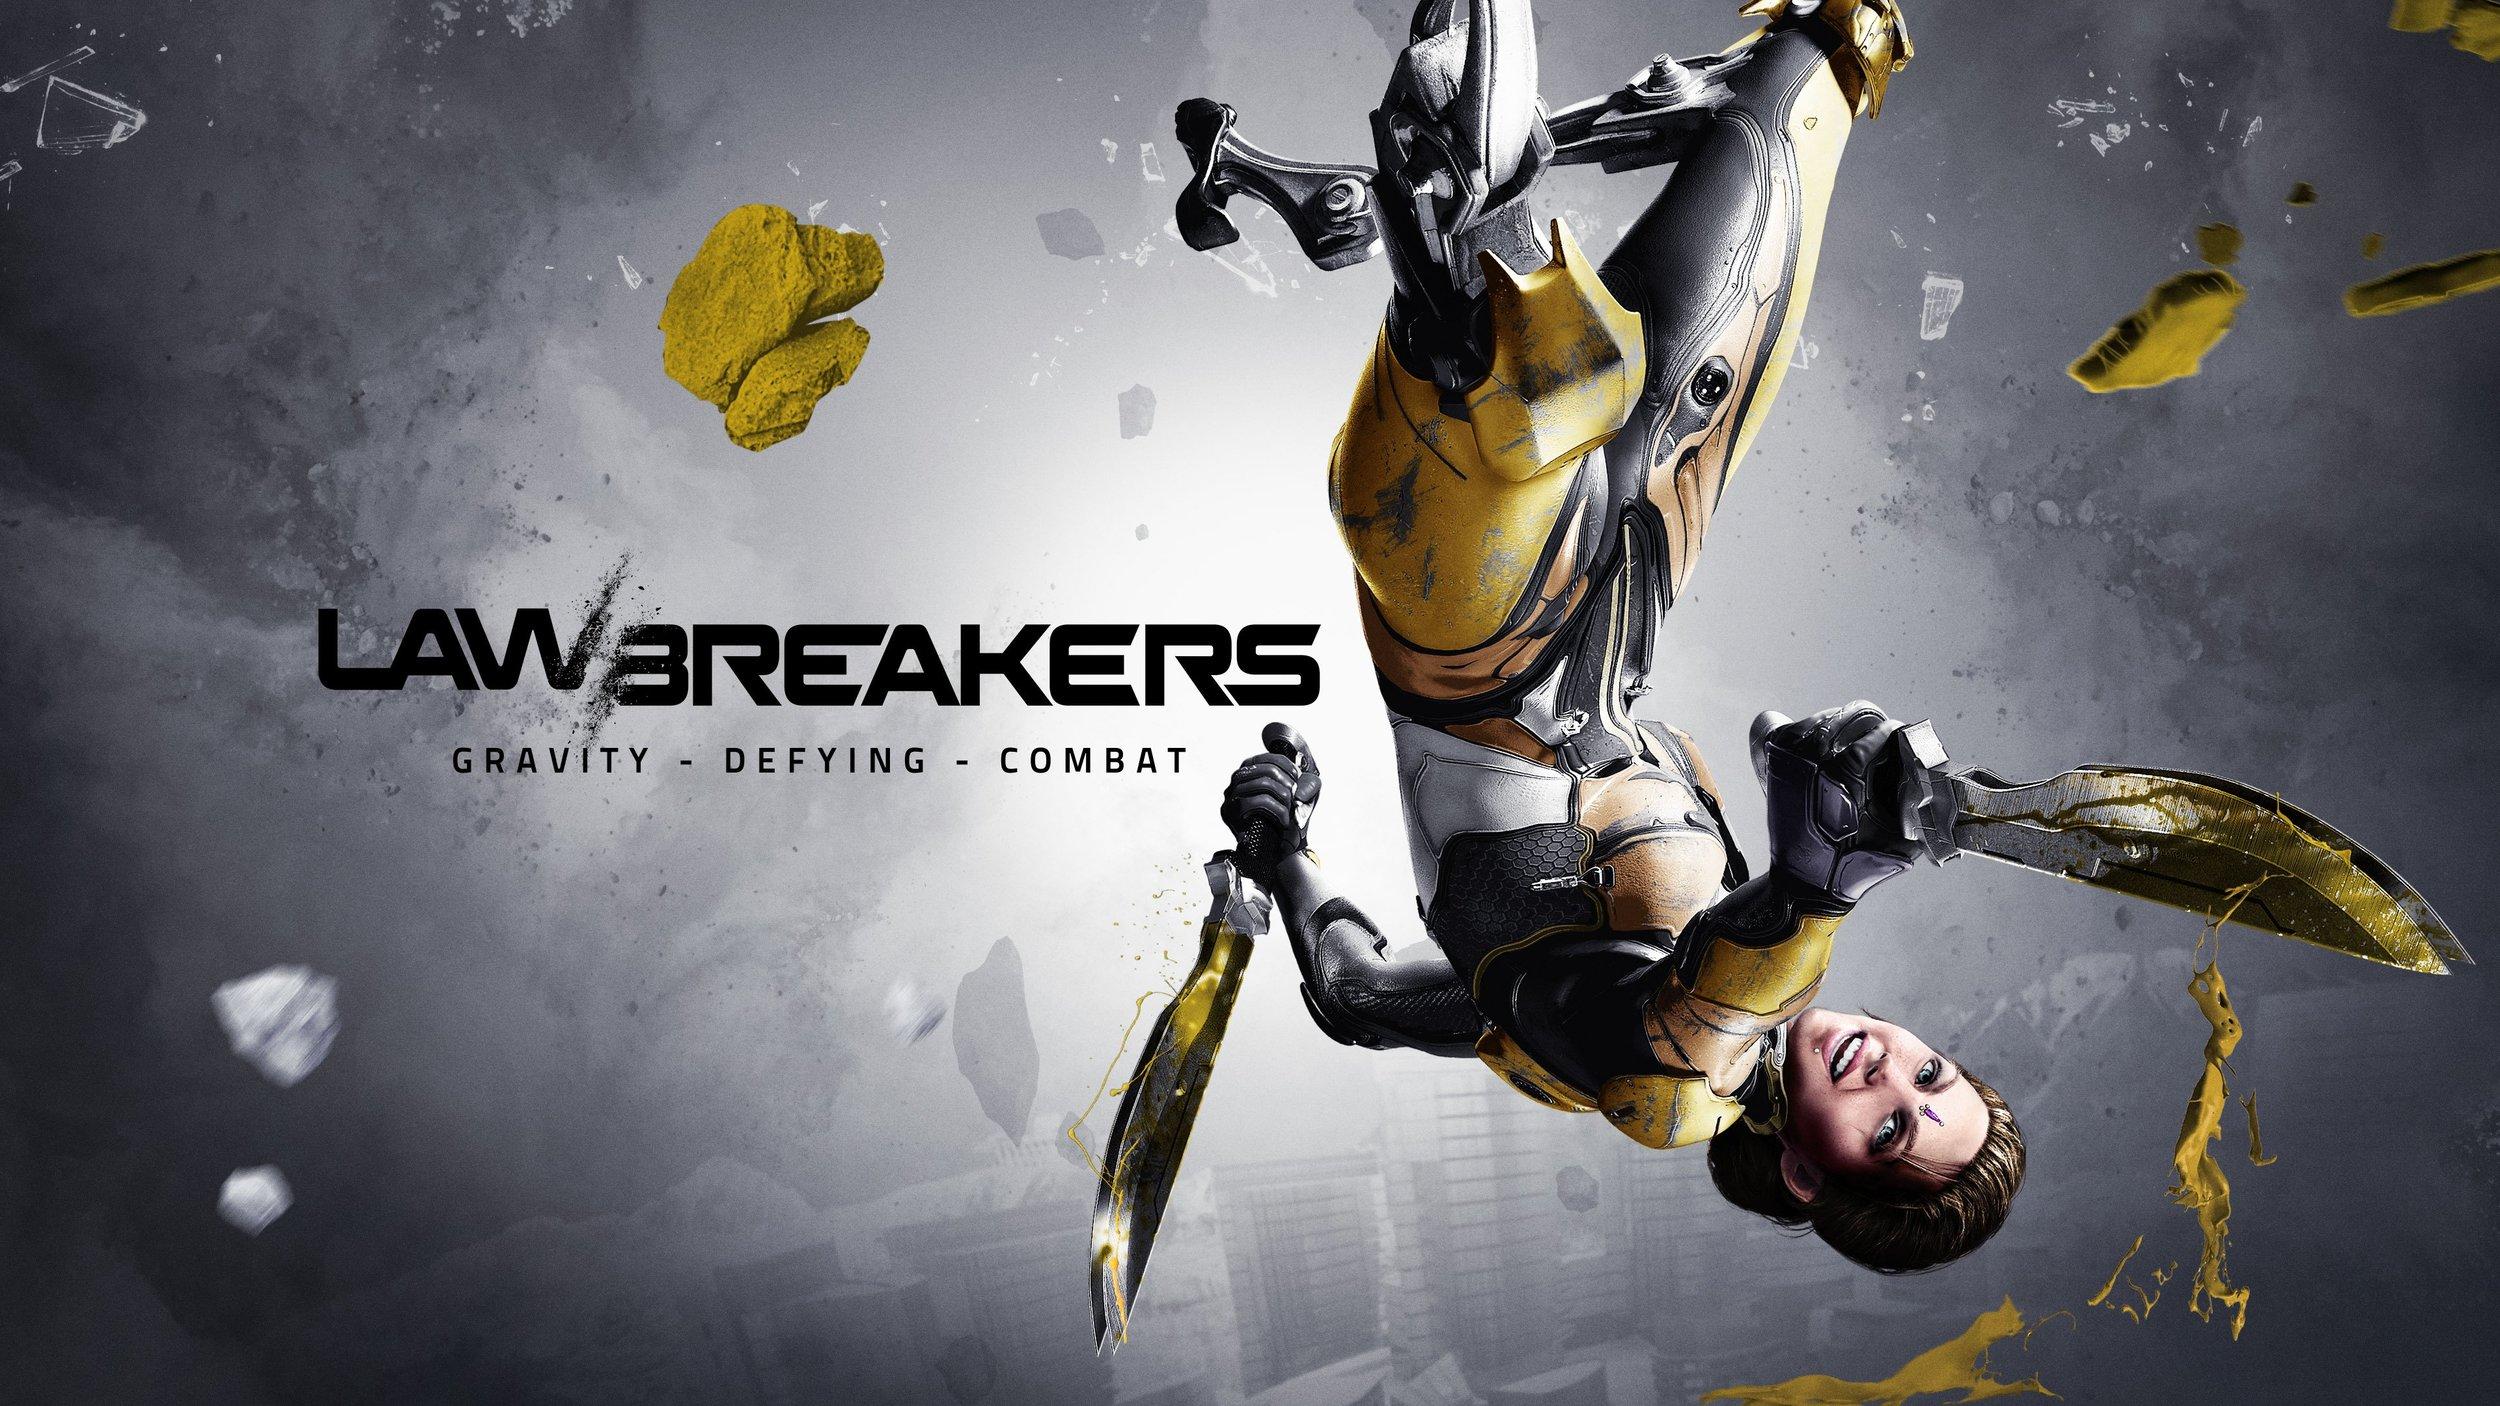 Lawbreakers - RYZIN Provided Weapons for BossKey Studios.(UNDER NDA)